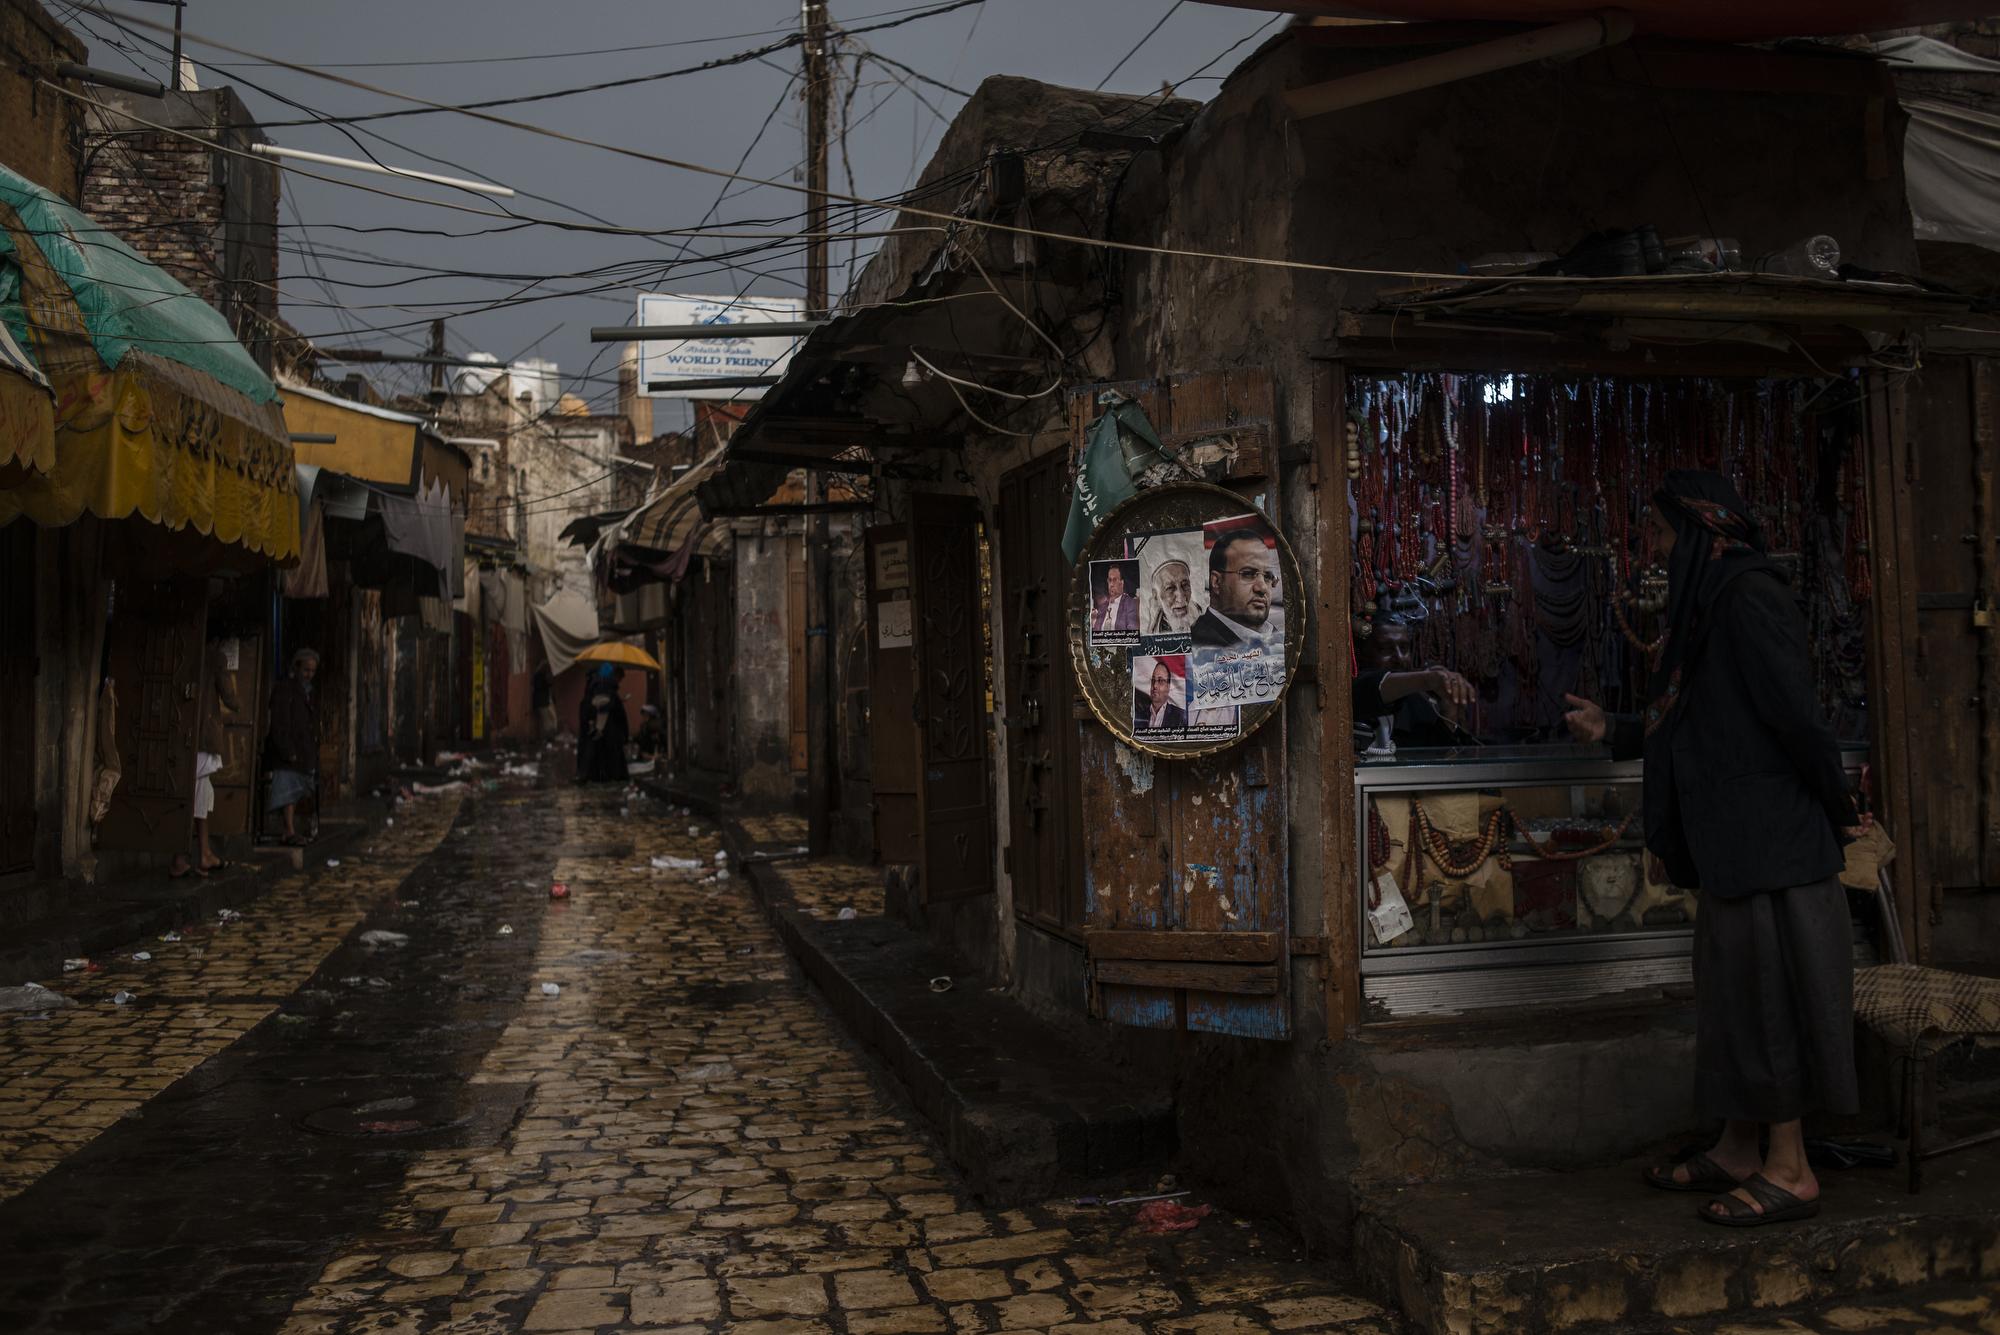 AlexPotter_Yemen_InterceptHealth_ContextPhotos_07.JPG